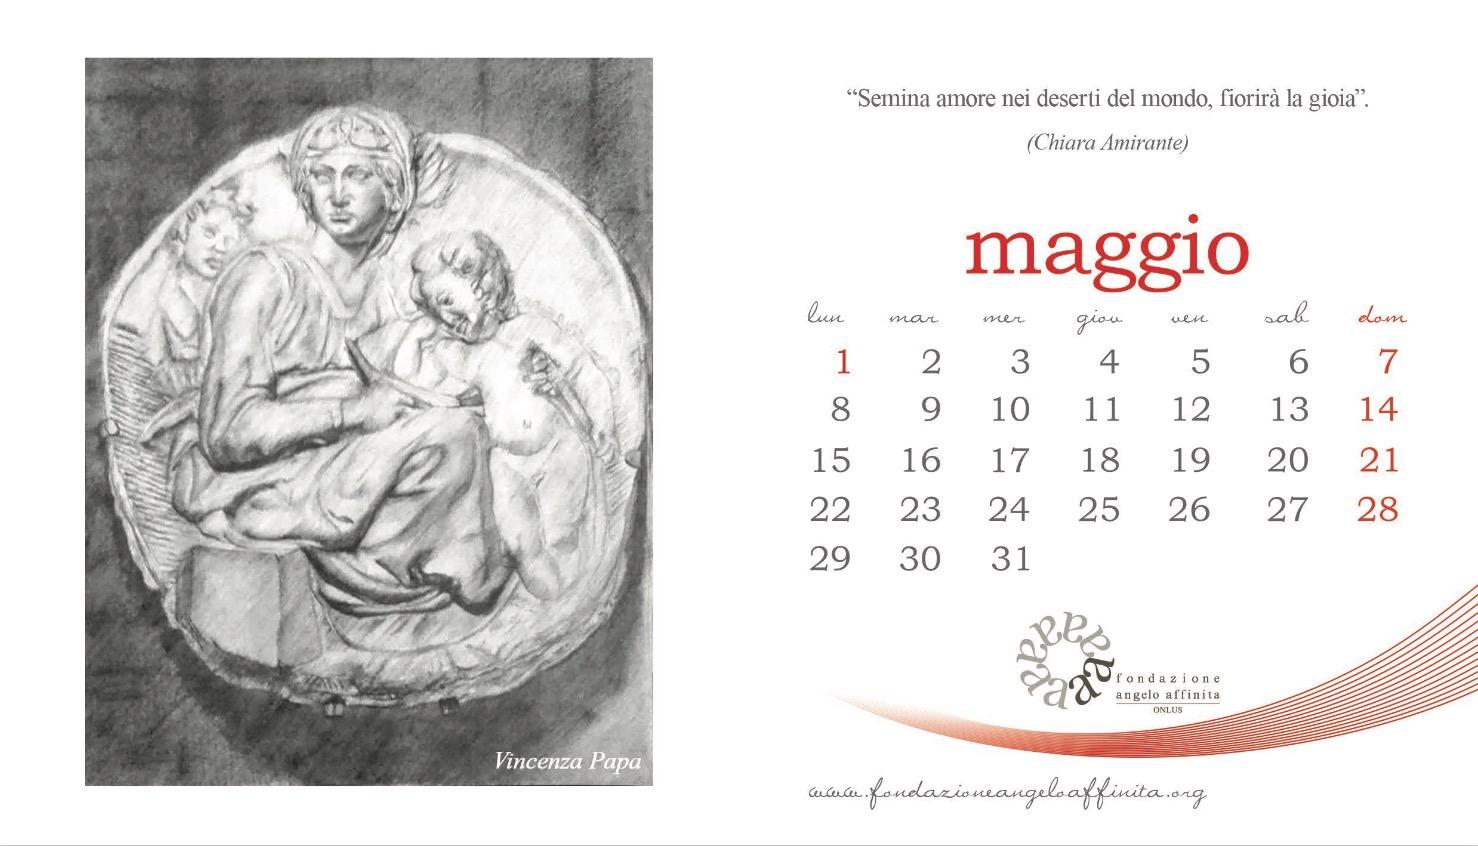 calendario-2017-fondazione-angelo-affinita_6